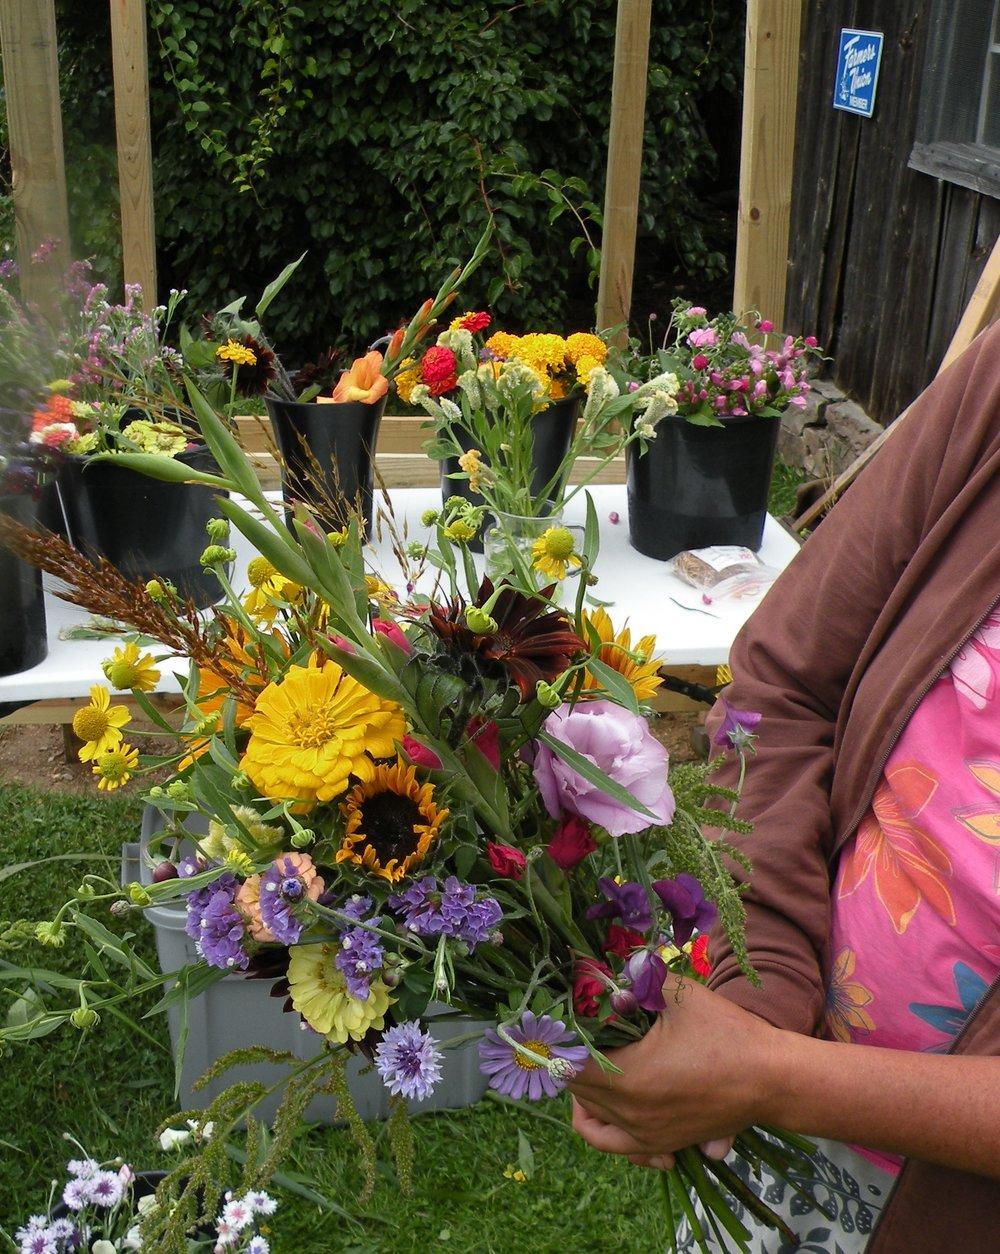 August flower palette, a peak season culmination of perennial and annual cuts. Photo by Rob McClure